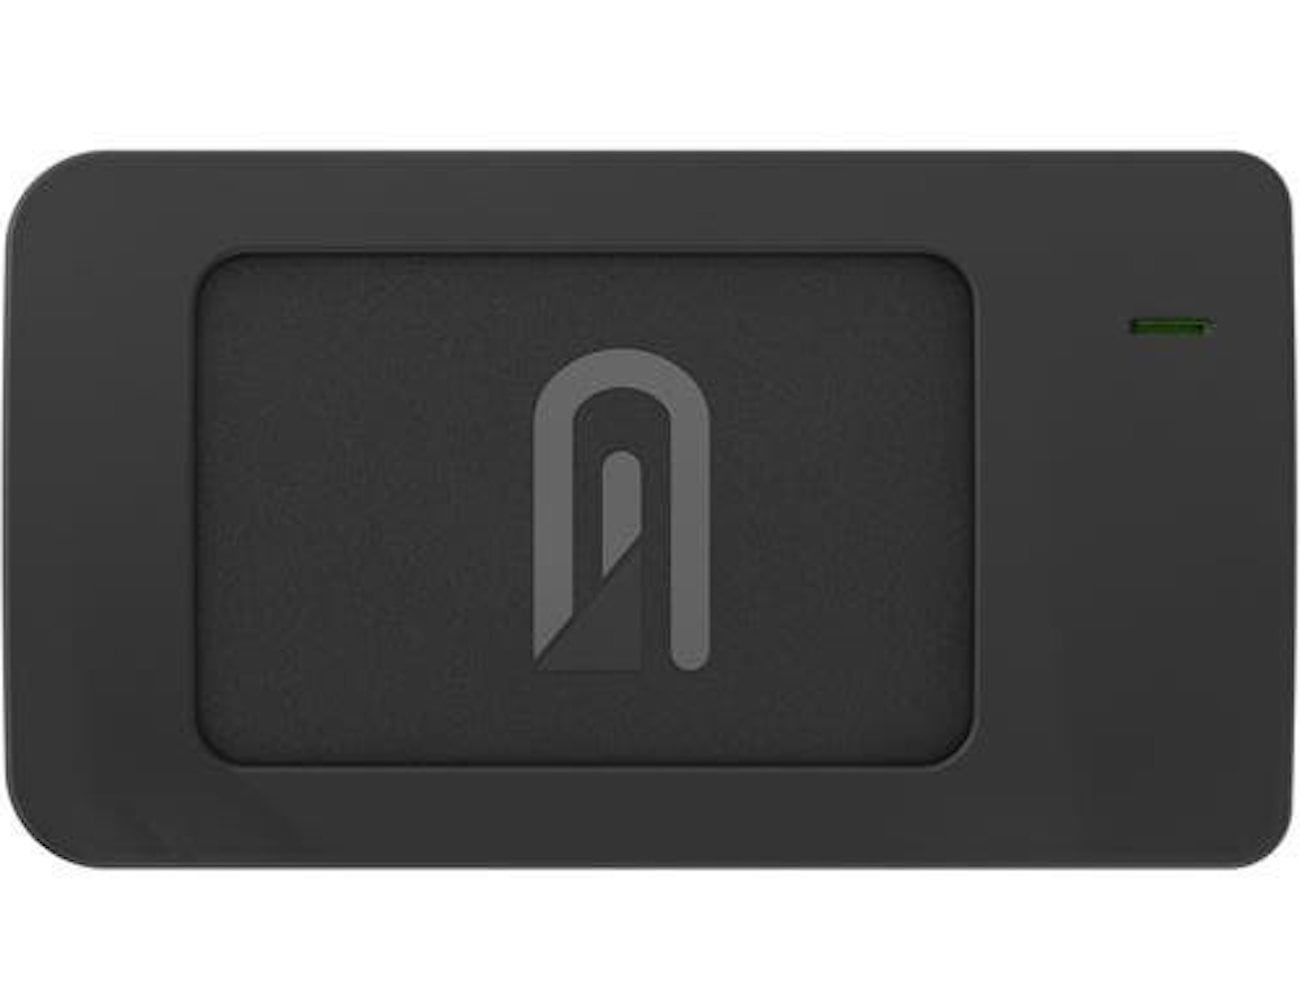 Glyph Tech Atom RAID Fast Portable SSD